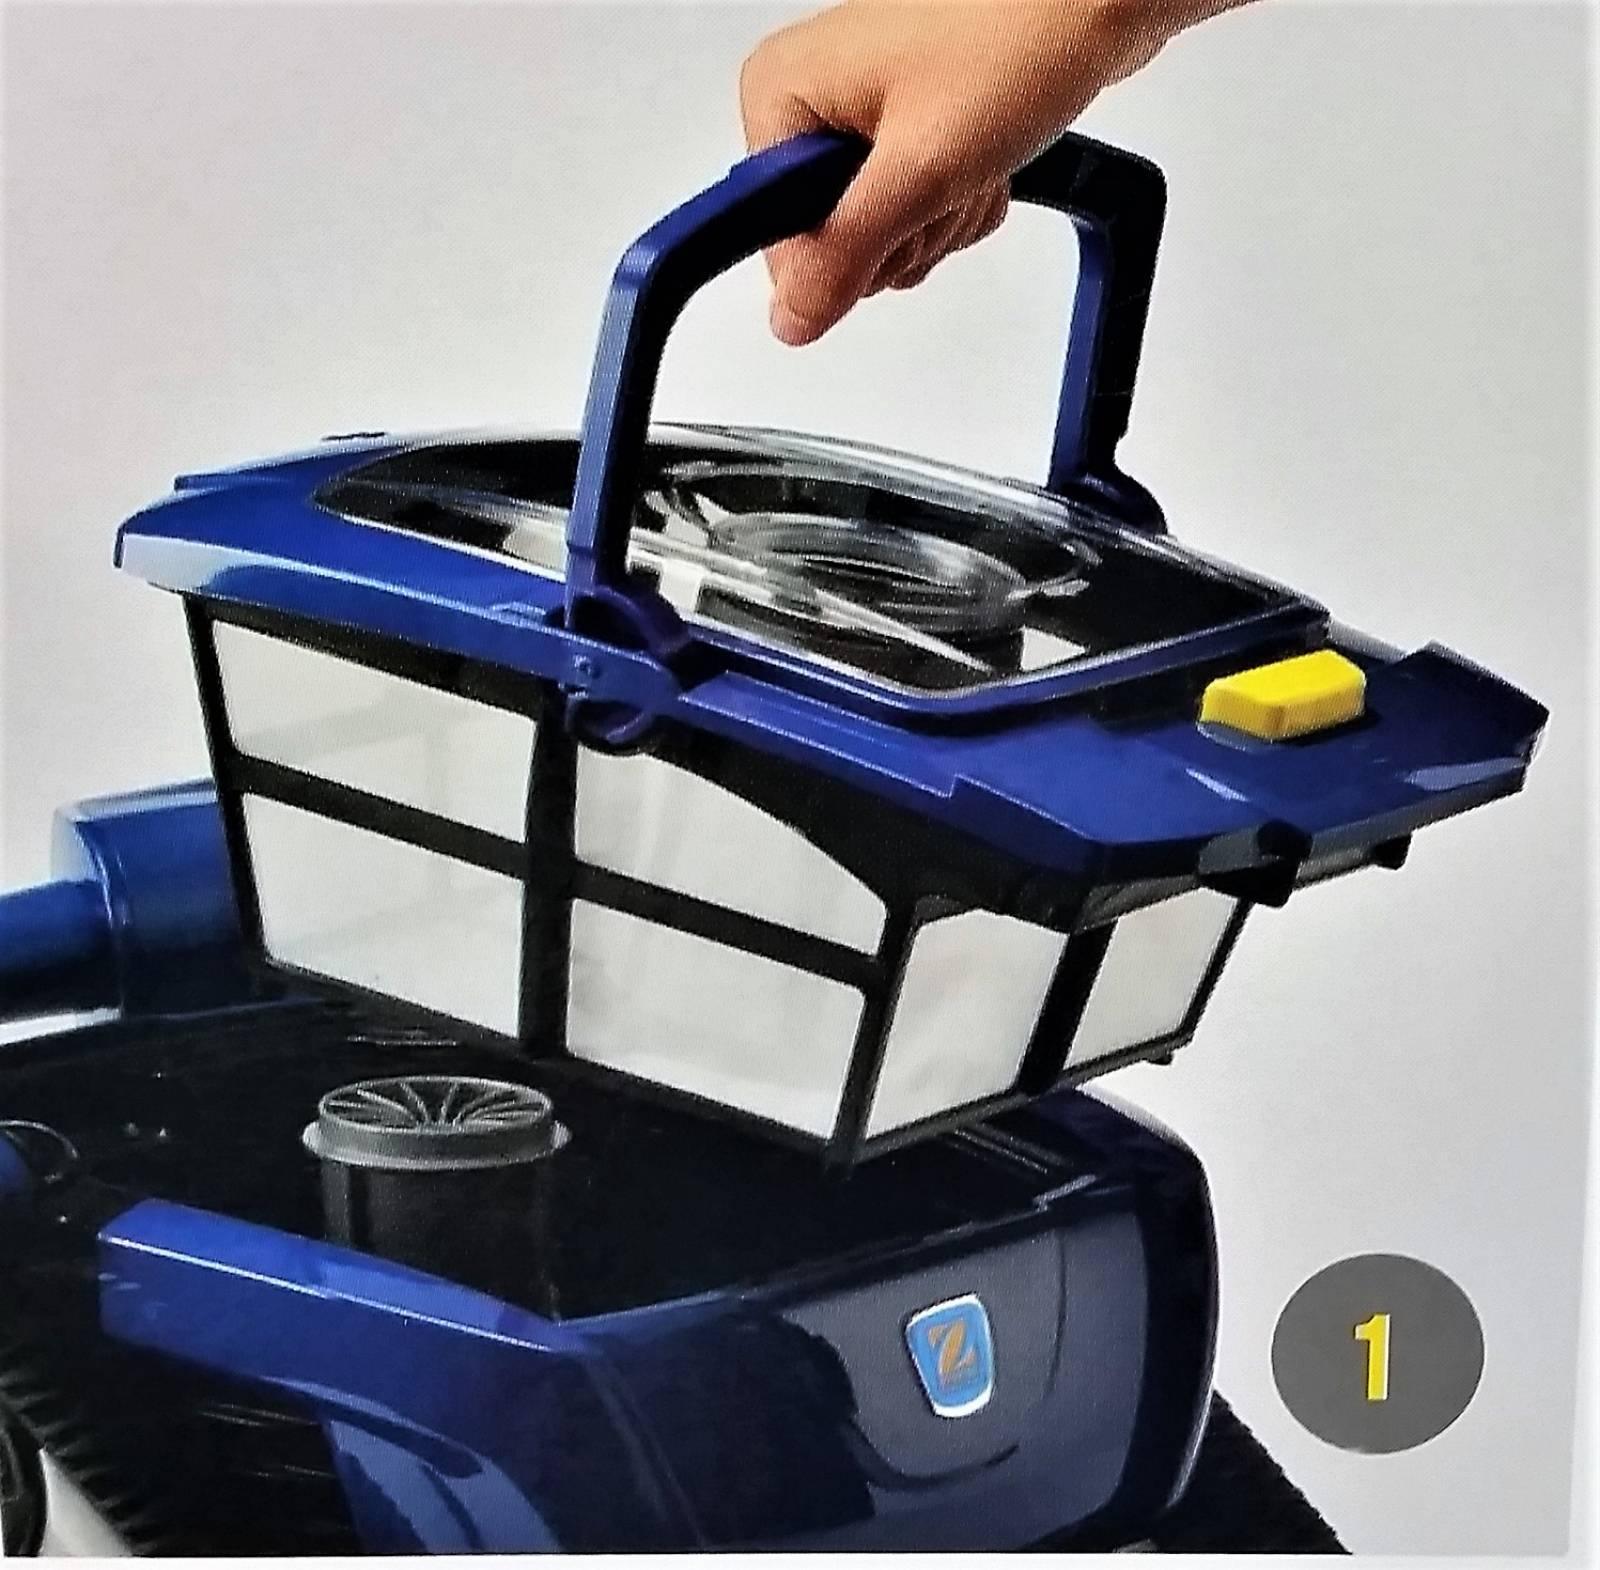 Robot Piscine Zodiac Cyclonx Pro Rc4400 - Jce Piscines avec Robot Piscine Zodiac Rc 4400